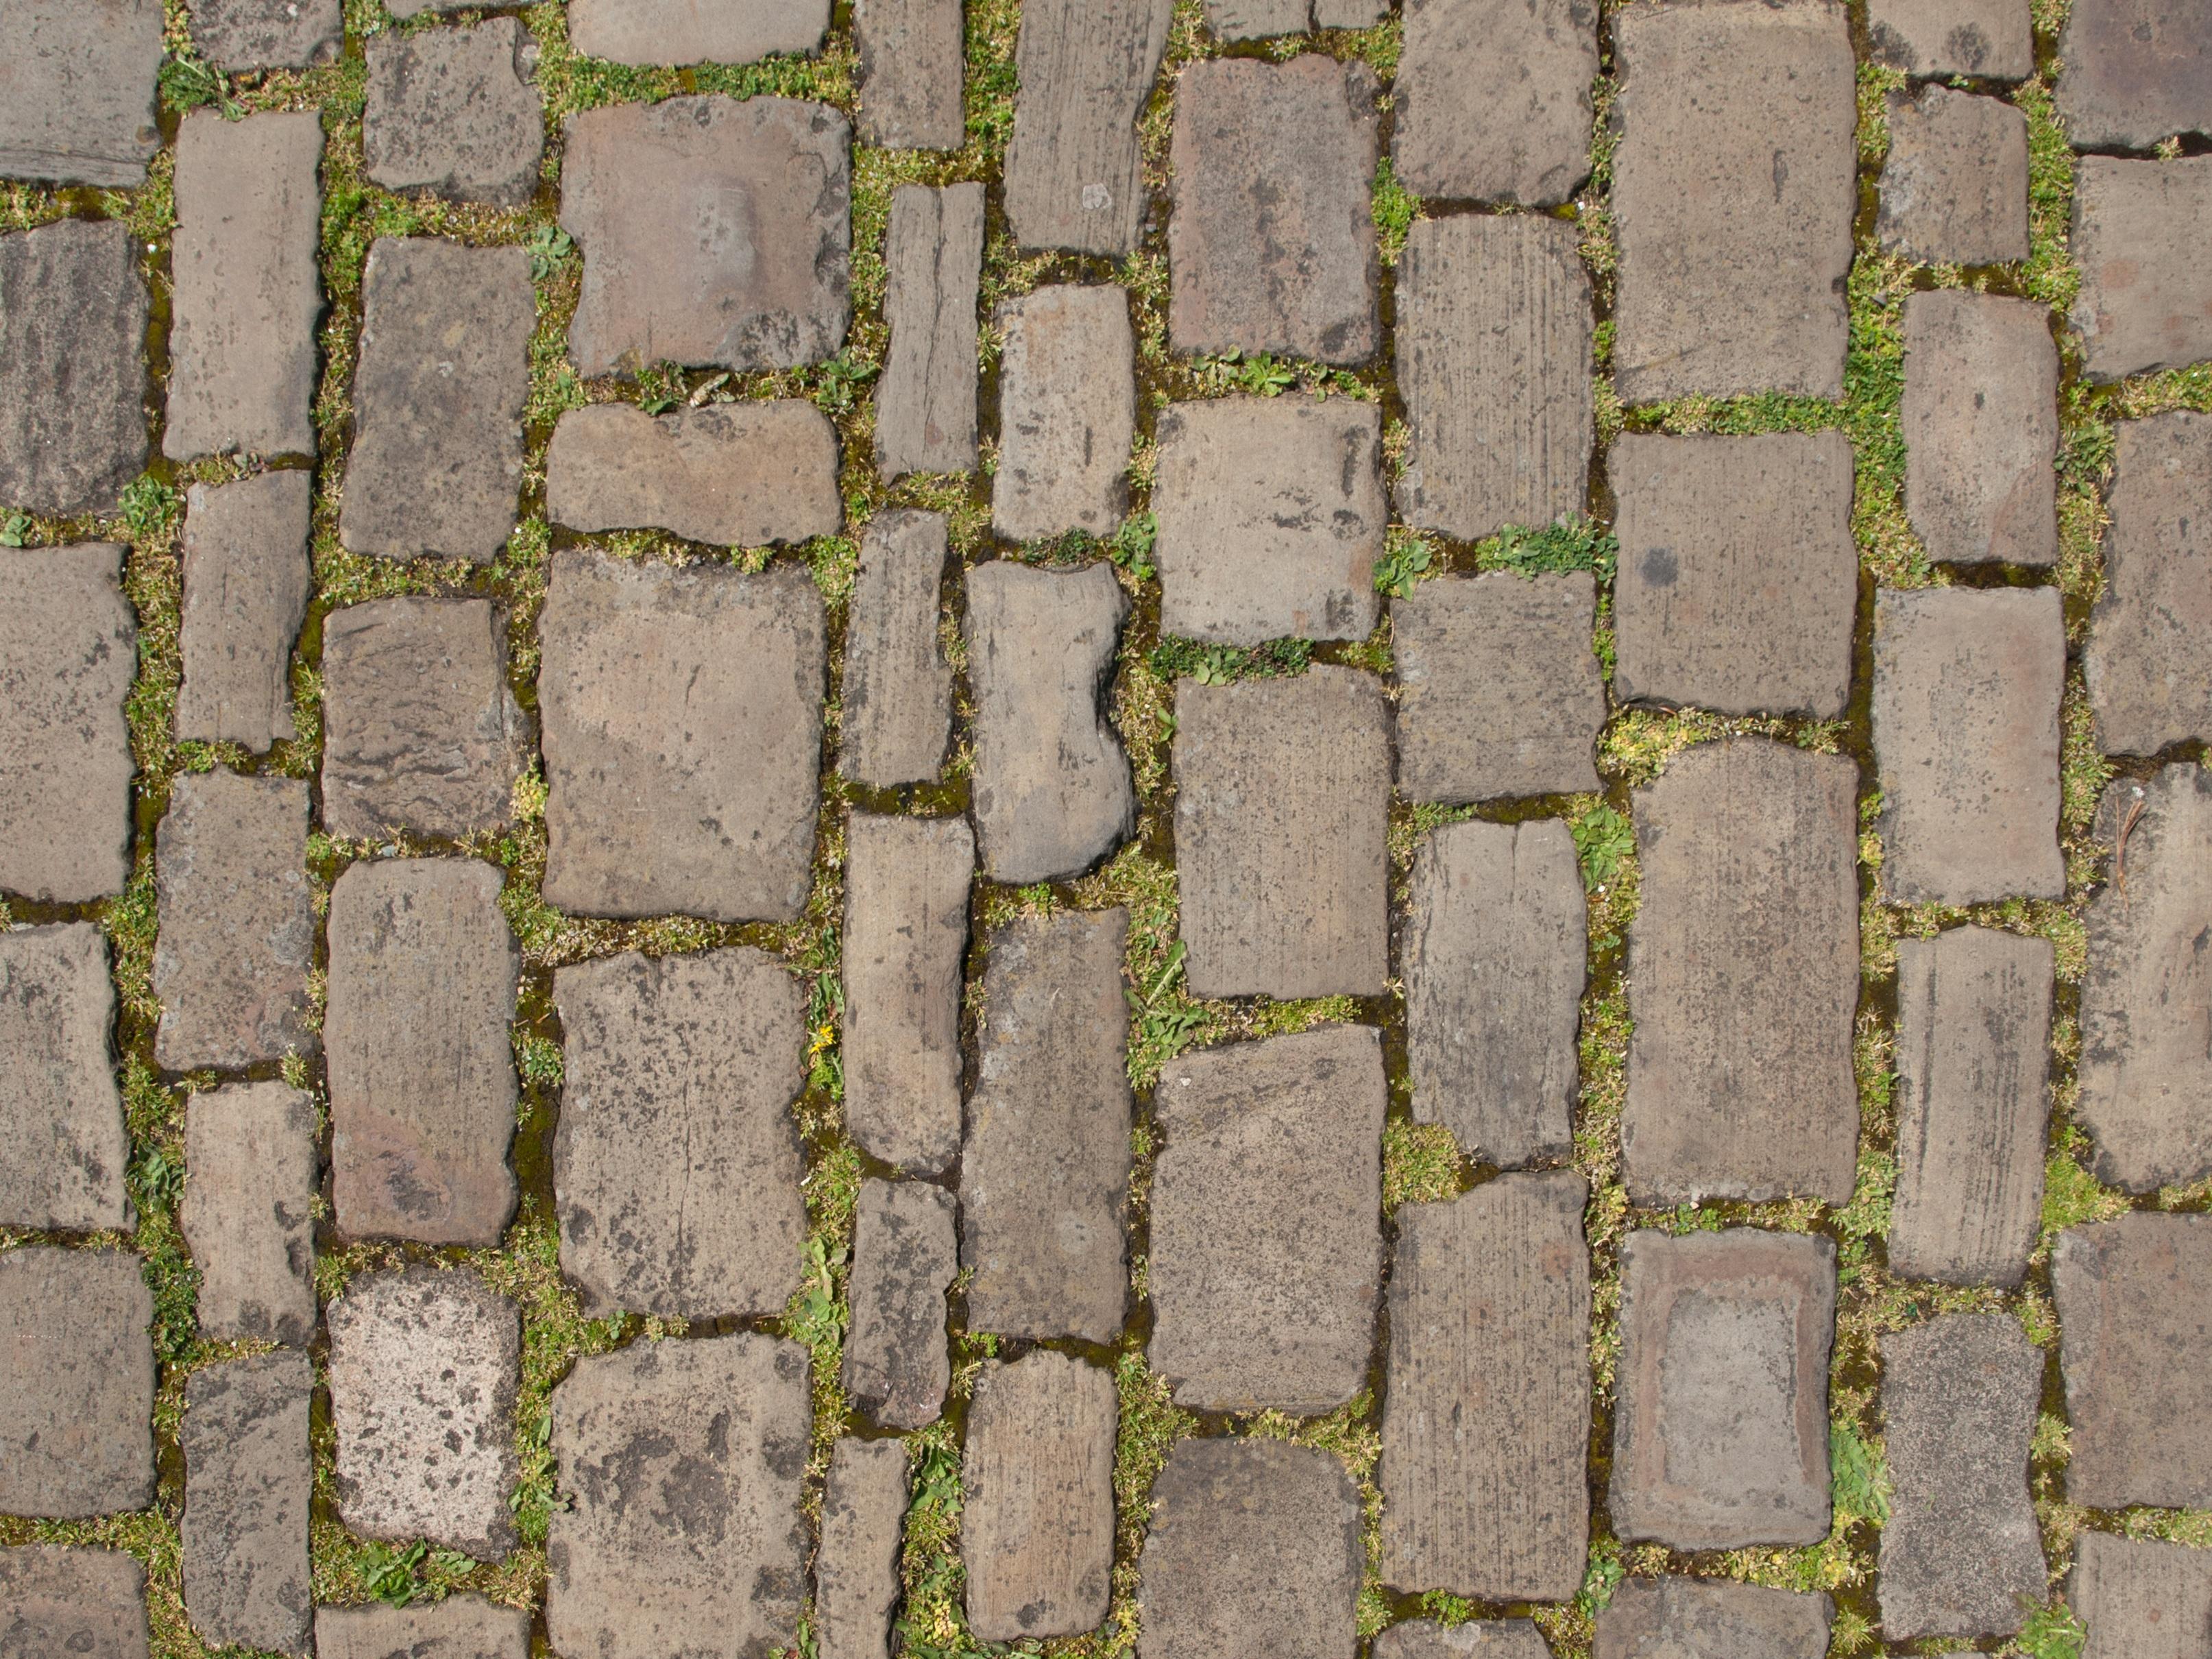 Fotos gratis c sped estructura la carretera textura - Ladrillos de piedra ...